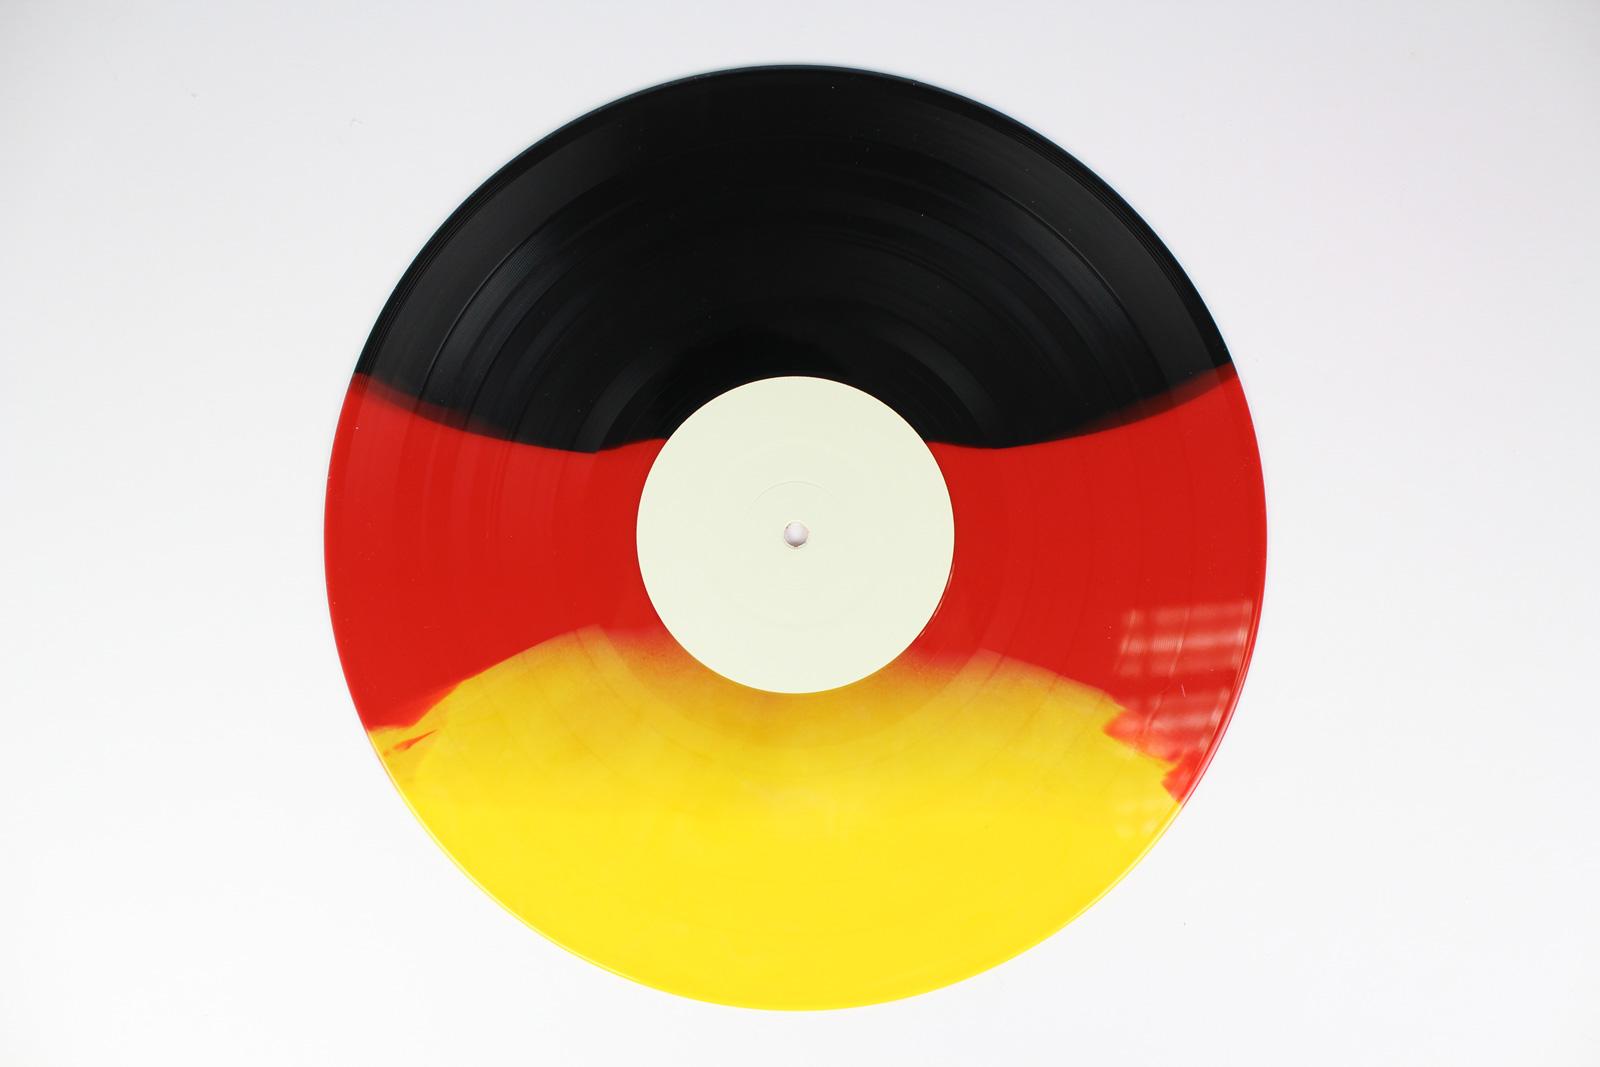 black / red-opaque / white 40%, 35% orange, 25% yellow